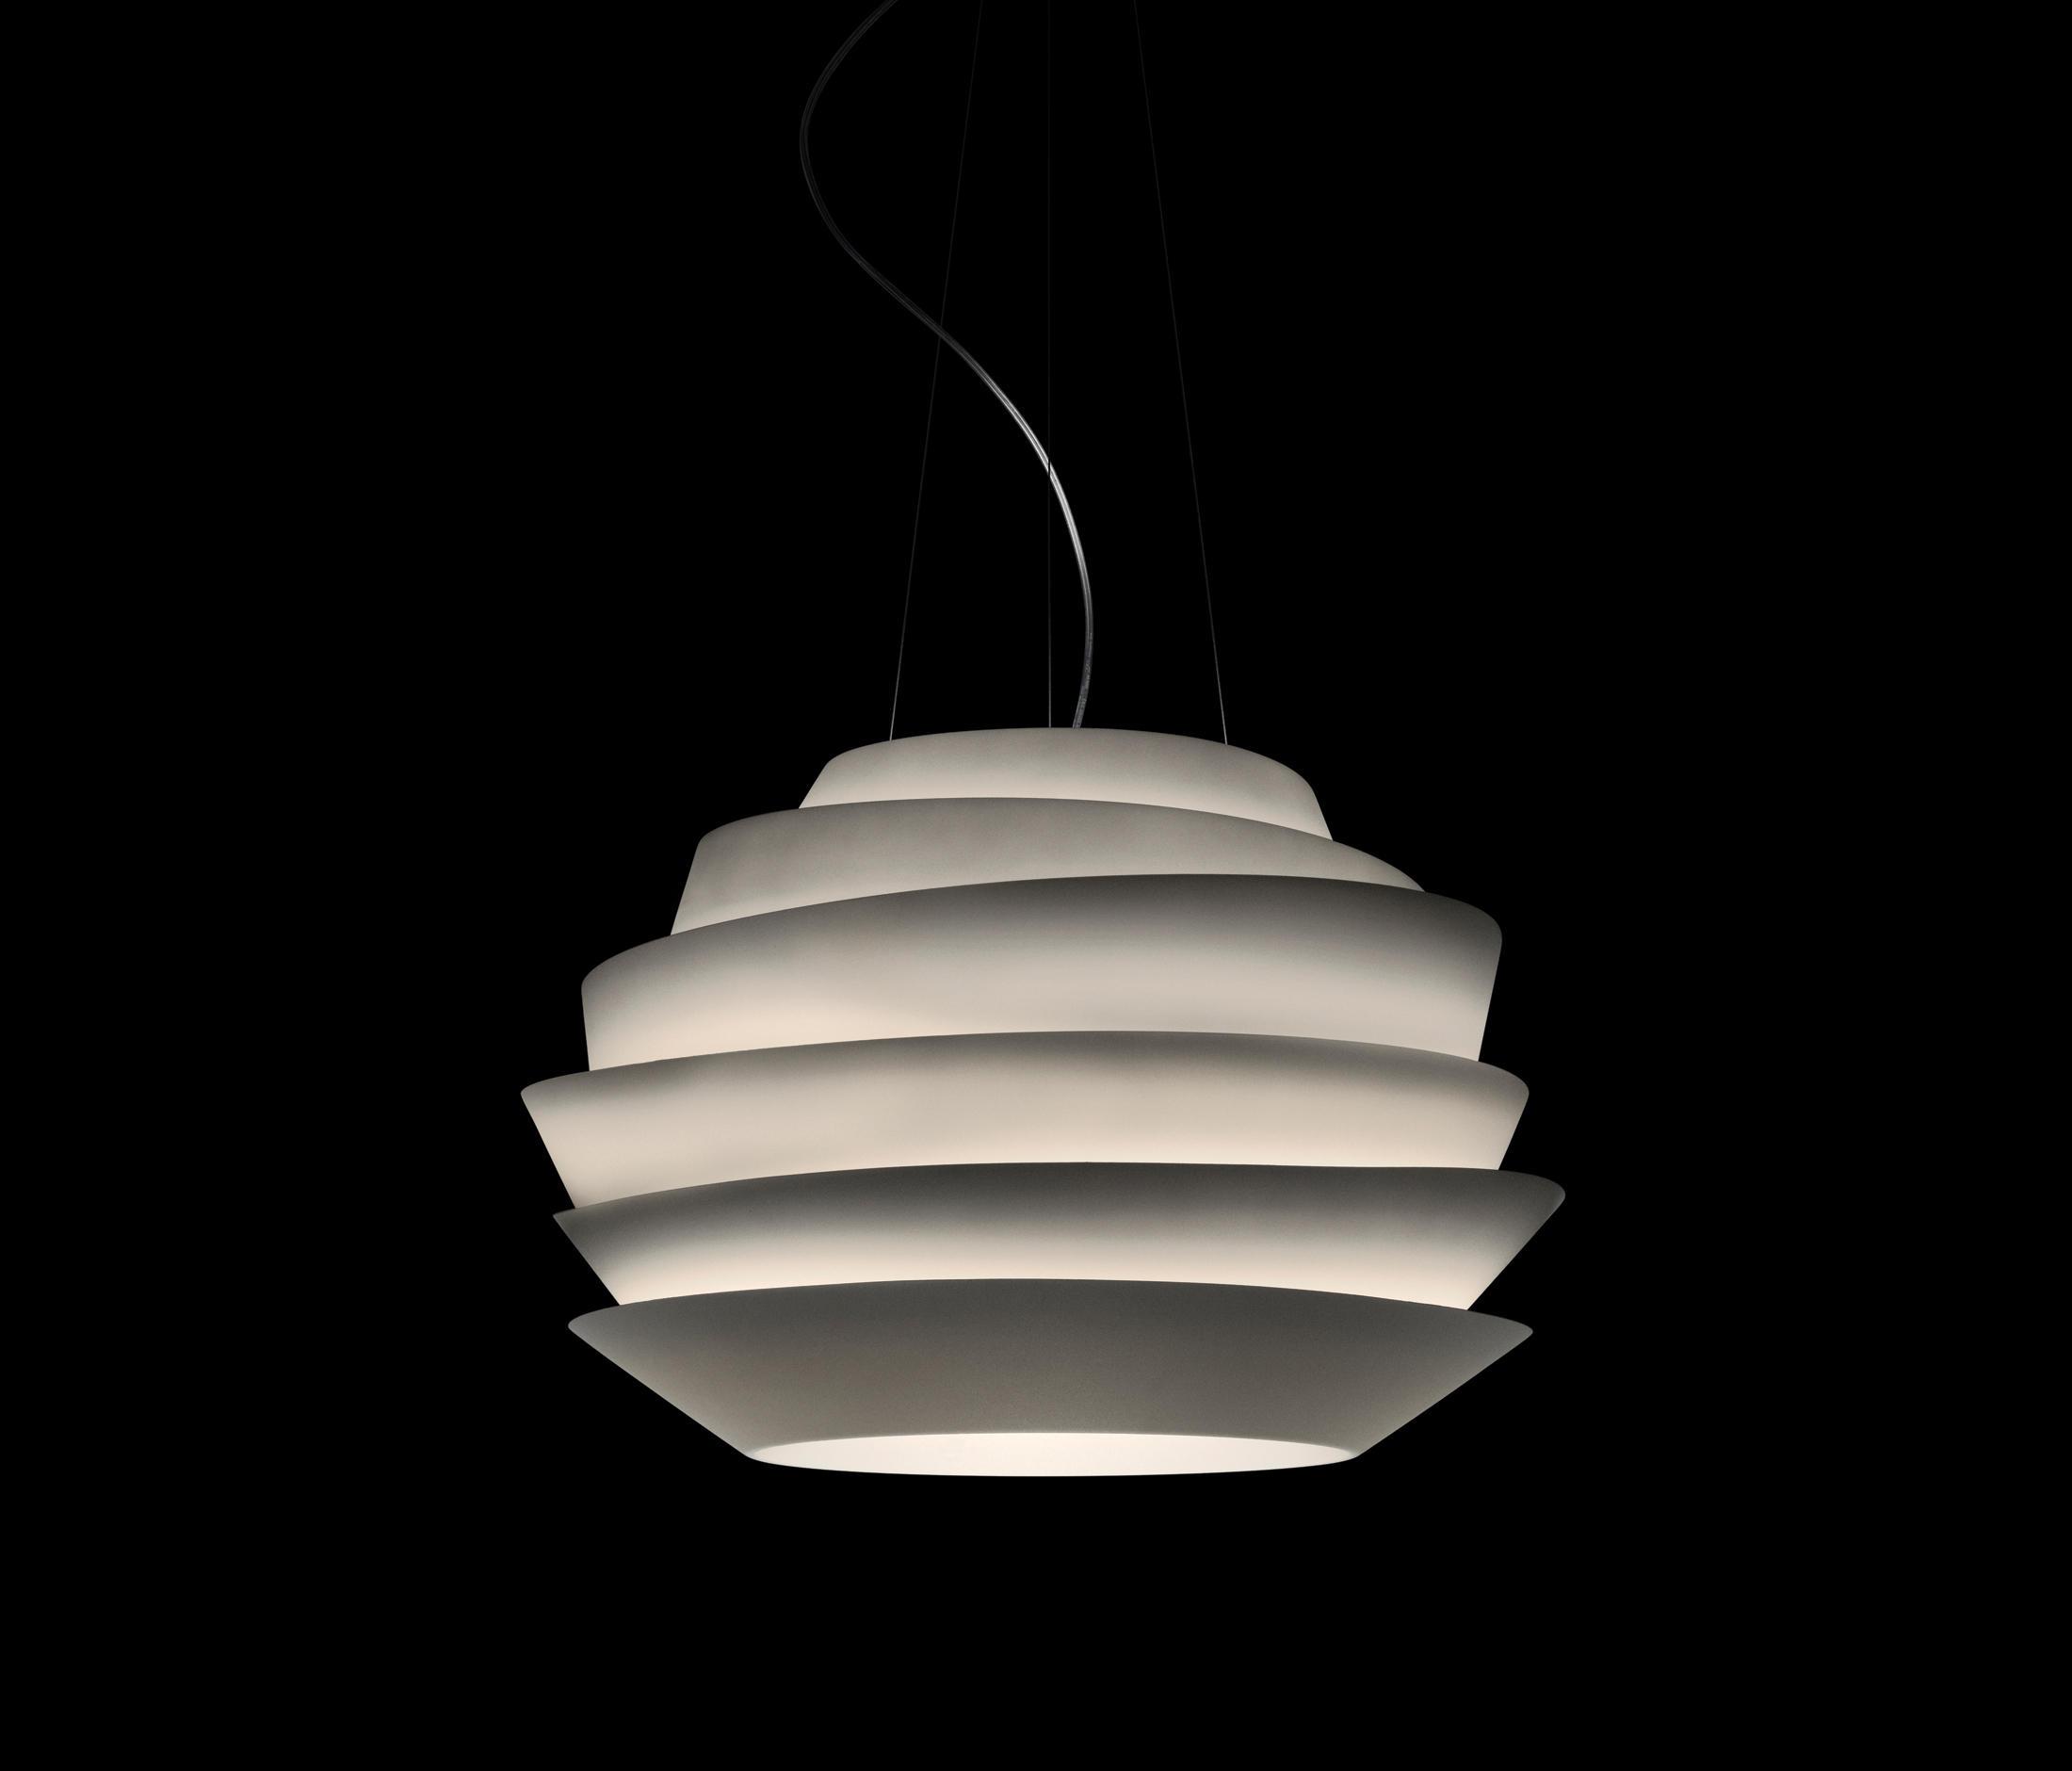 le soleil suspension aquamarine general lighting from. Black Bedroom Furniture Sets. Home Design Ideas